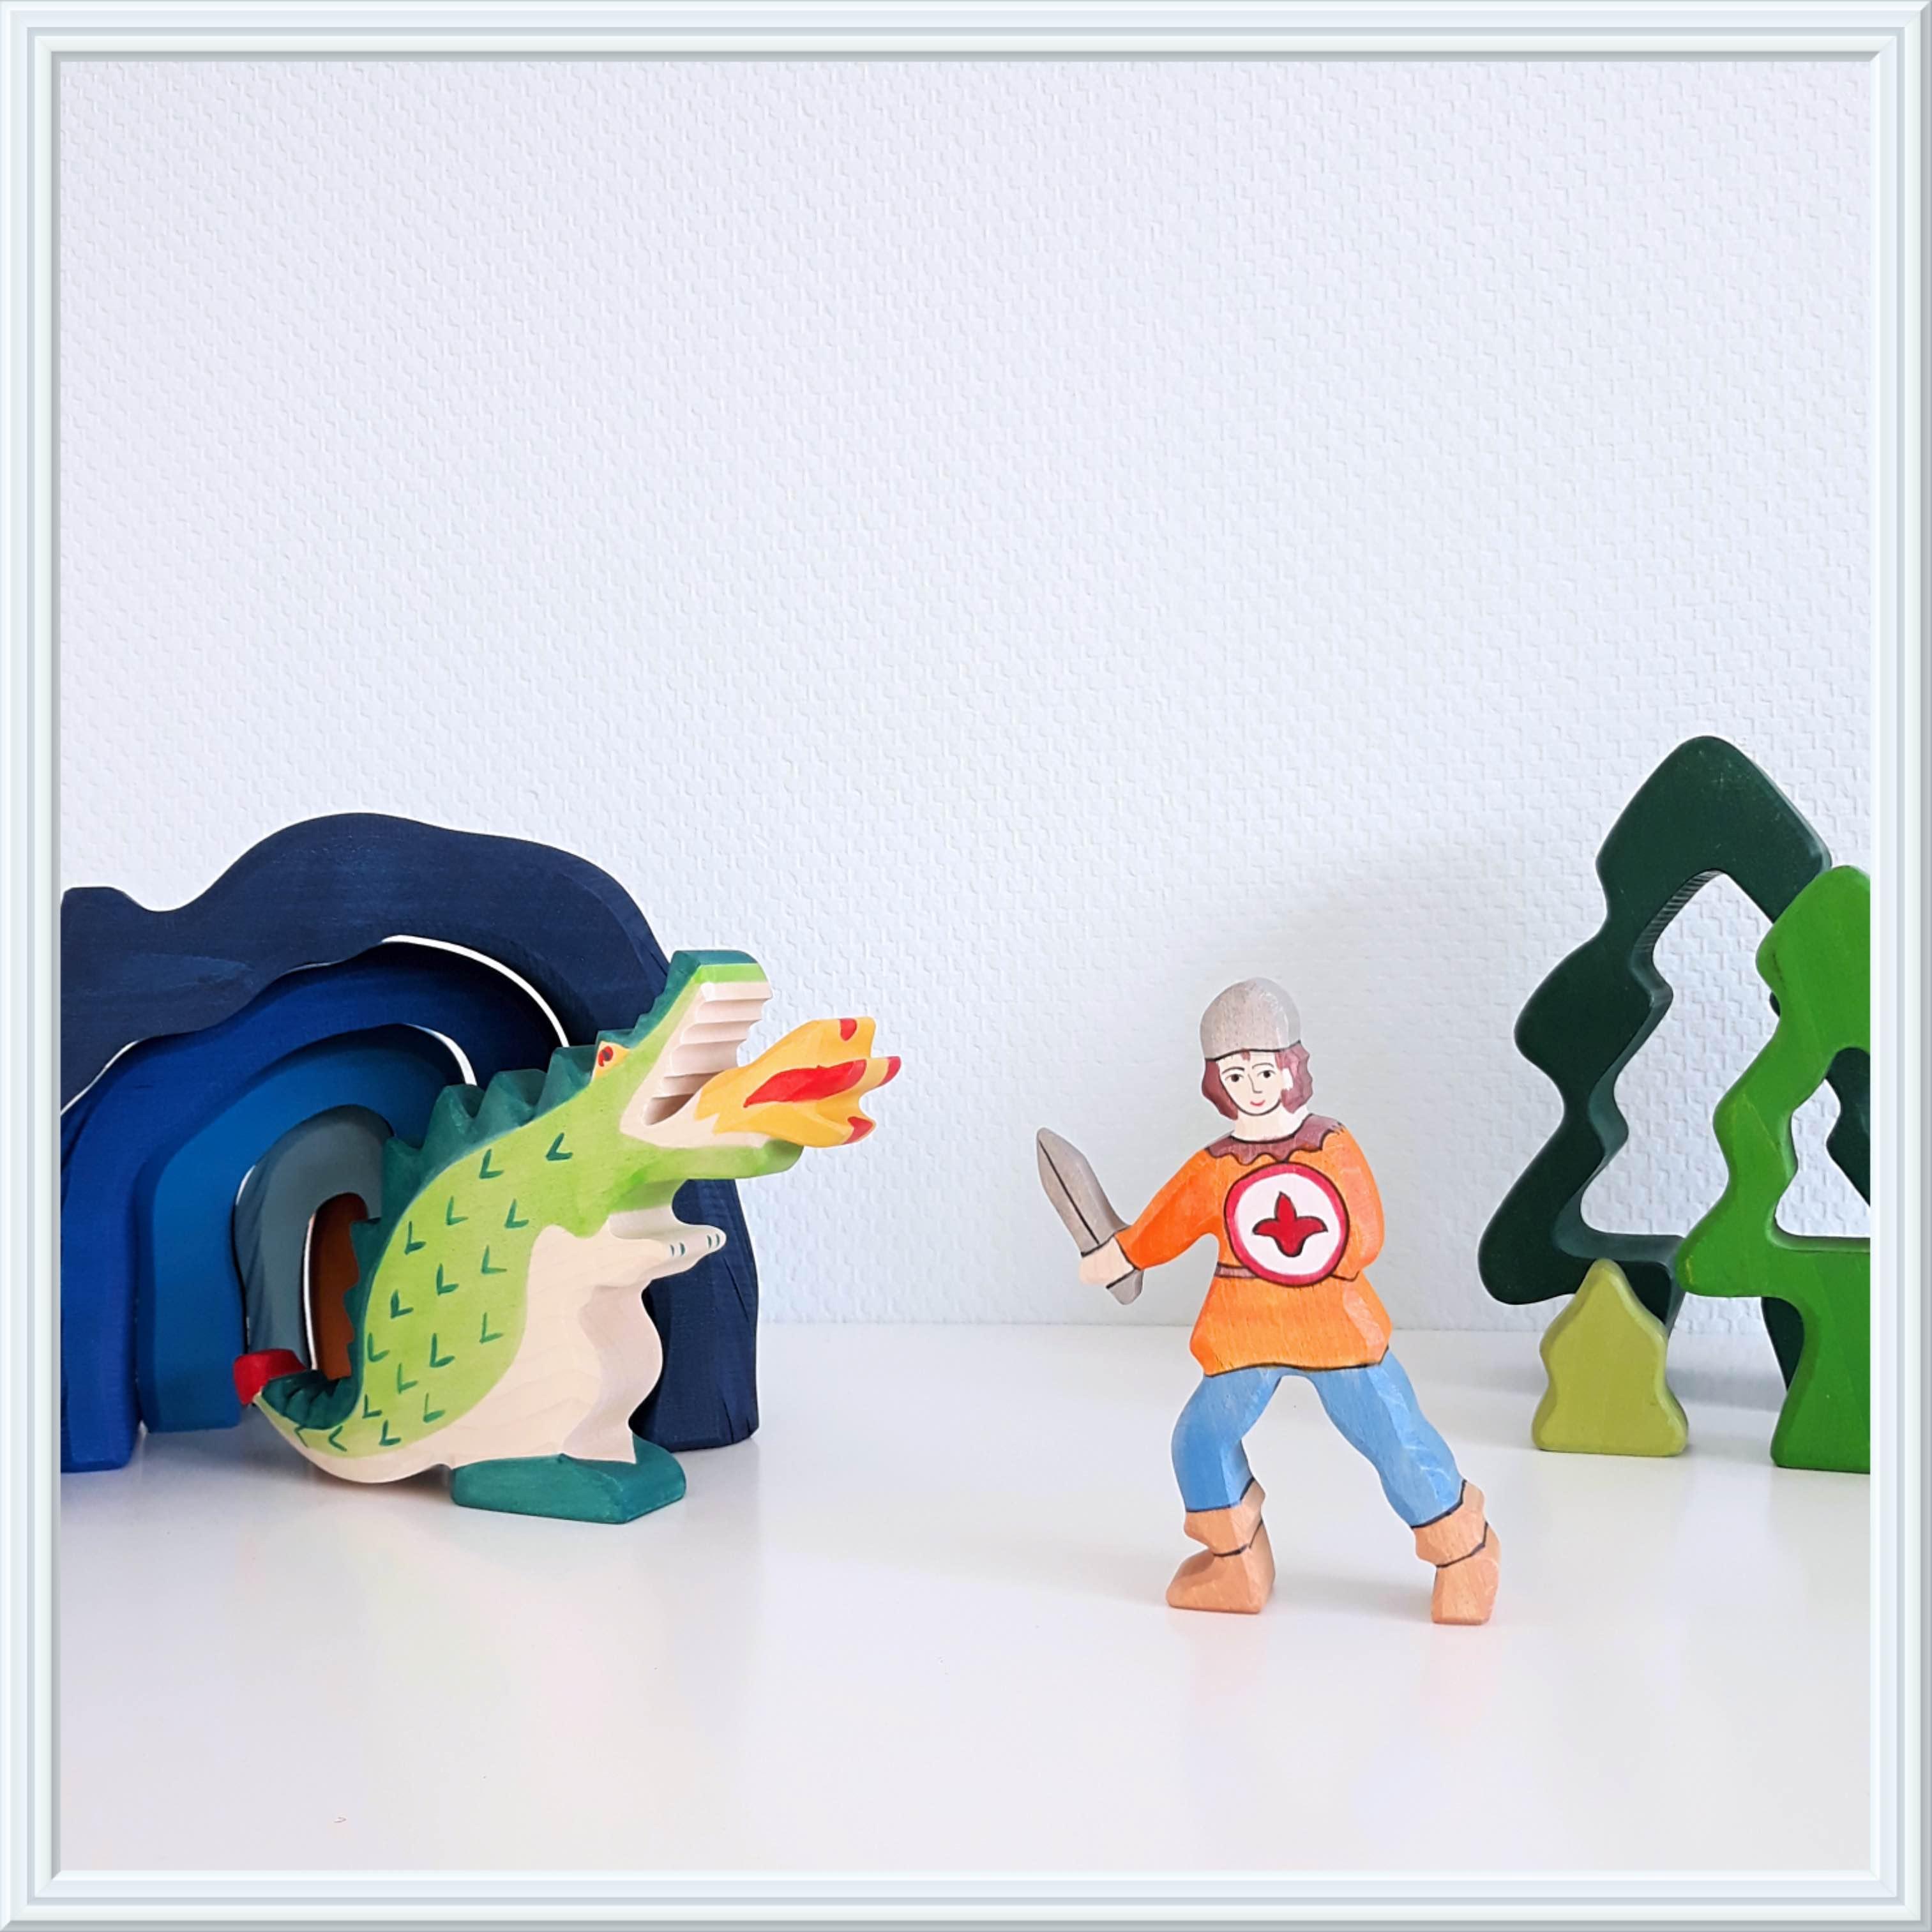 houtspel sprookjesmaand joris en de draak